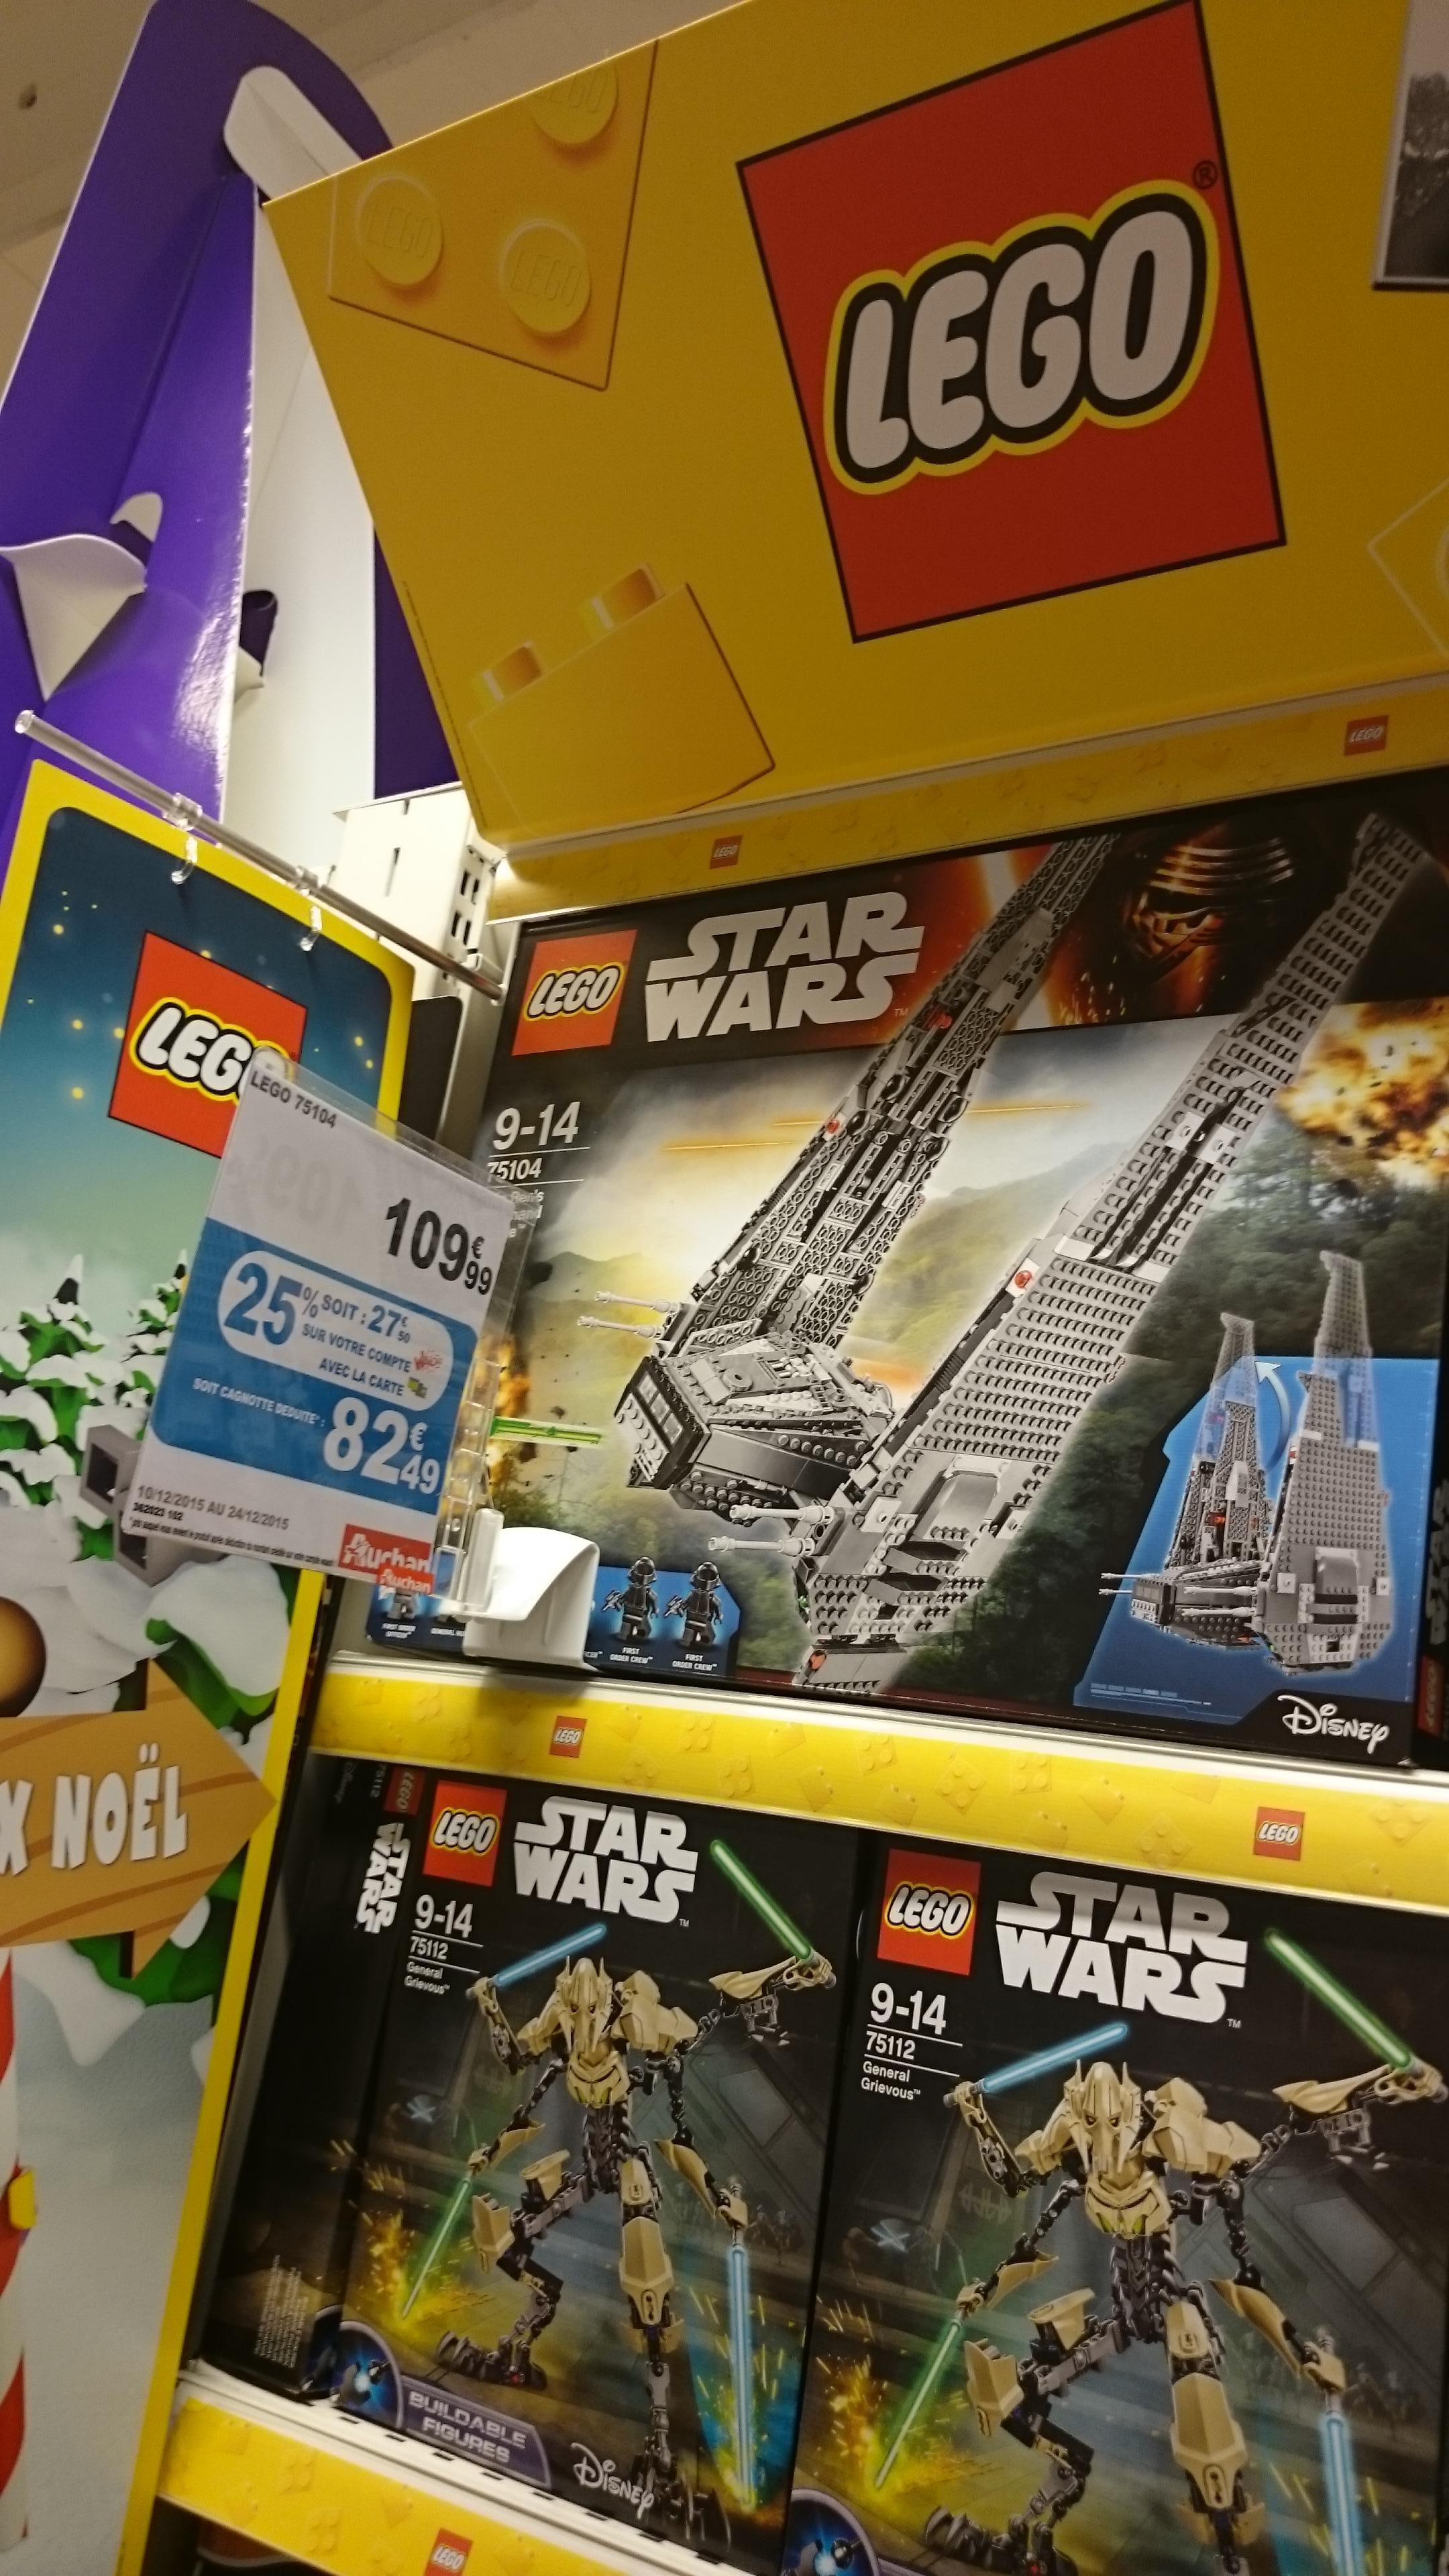 Sélection de Lego Star Wars en promotion - Ex : Kylo Ren's Command Shuttle n°75104 (via 27.50€ carte Waaoh)